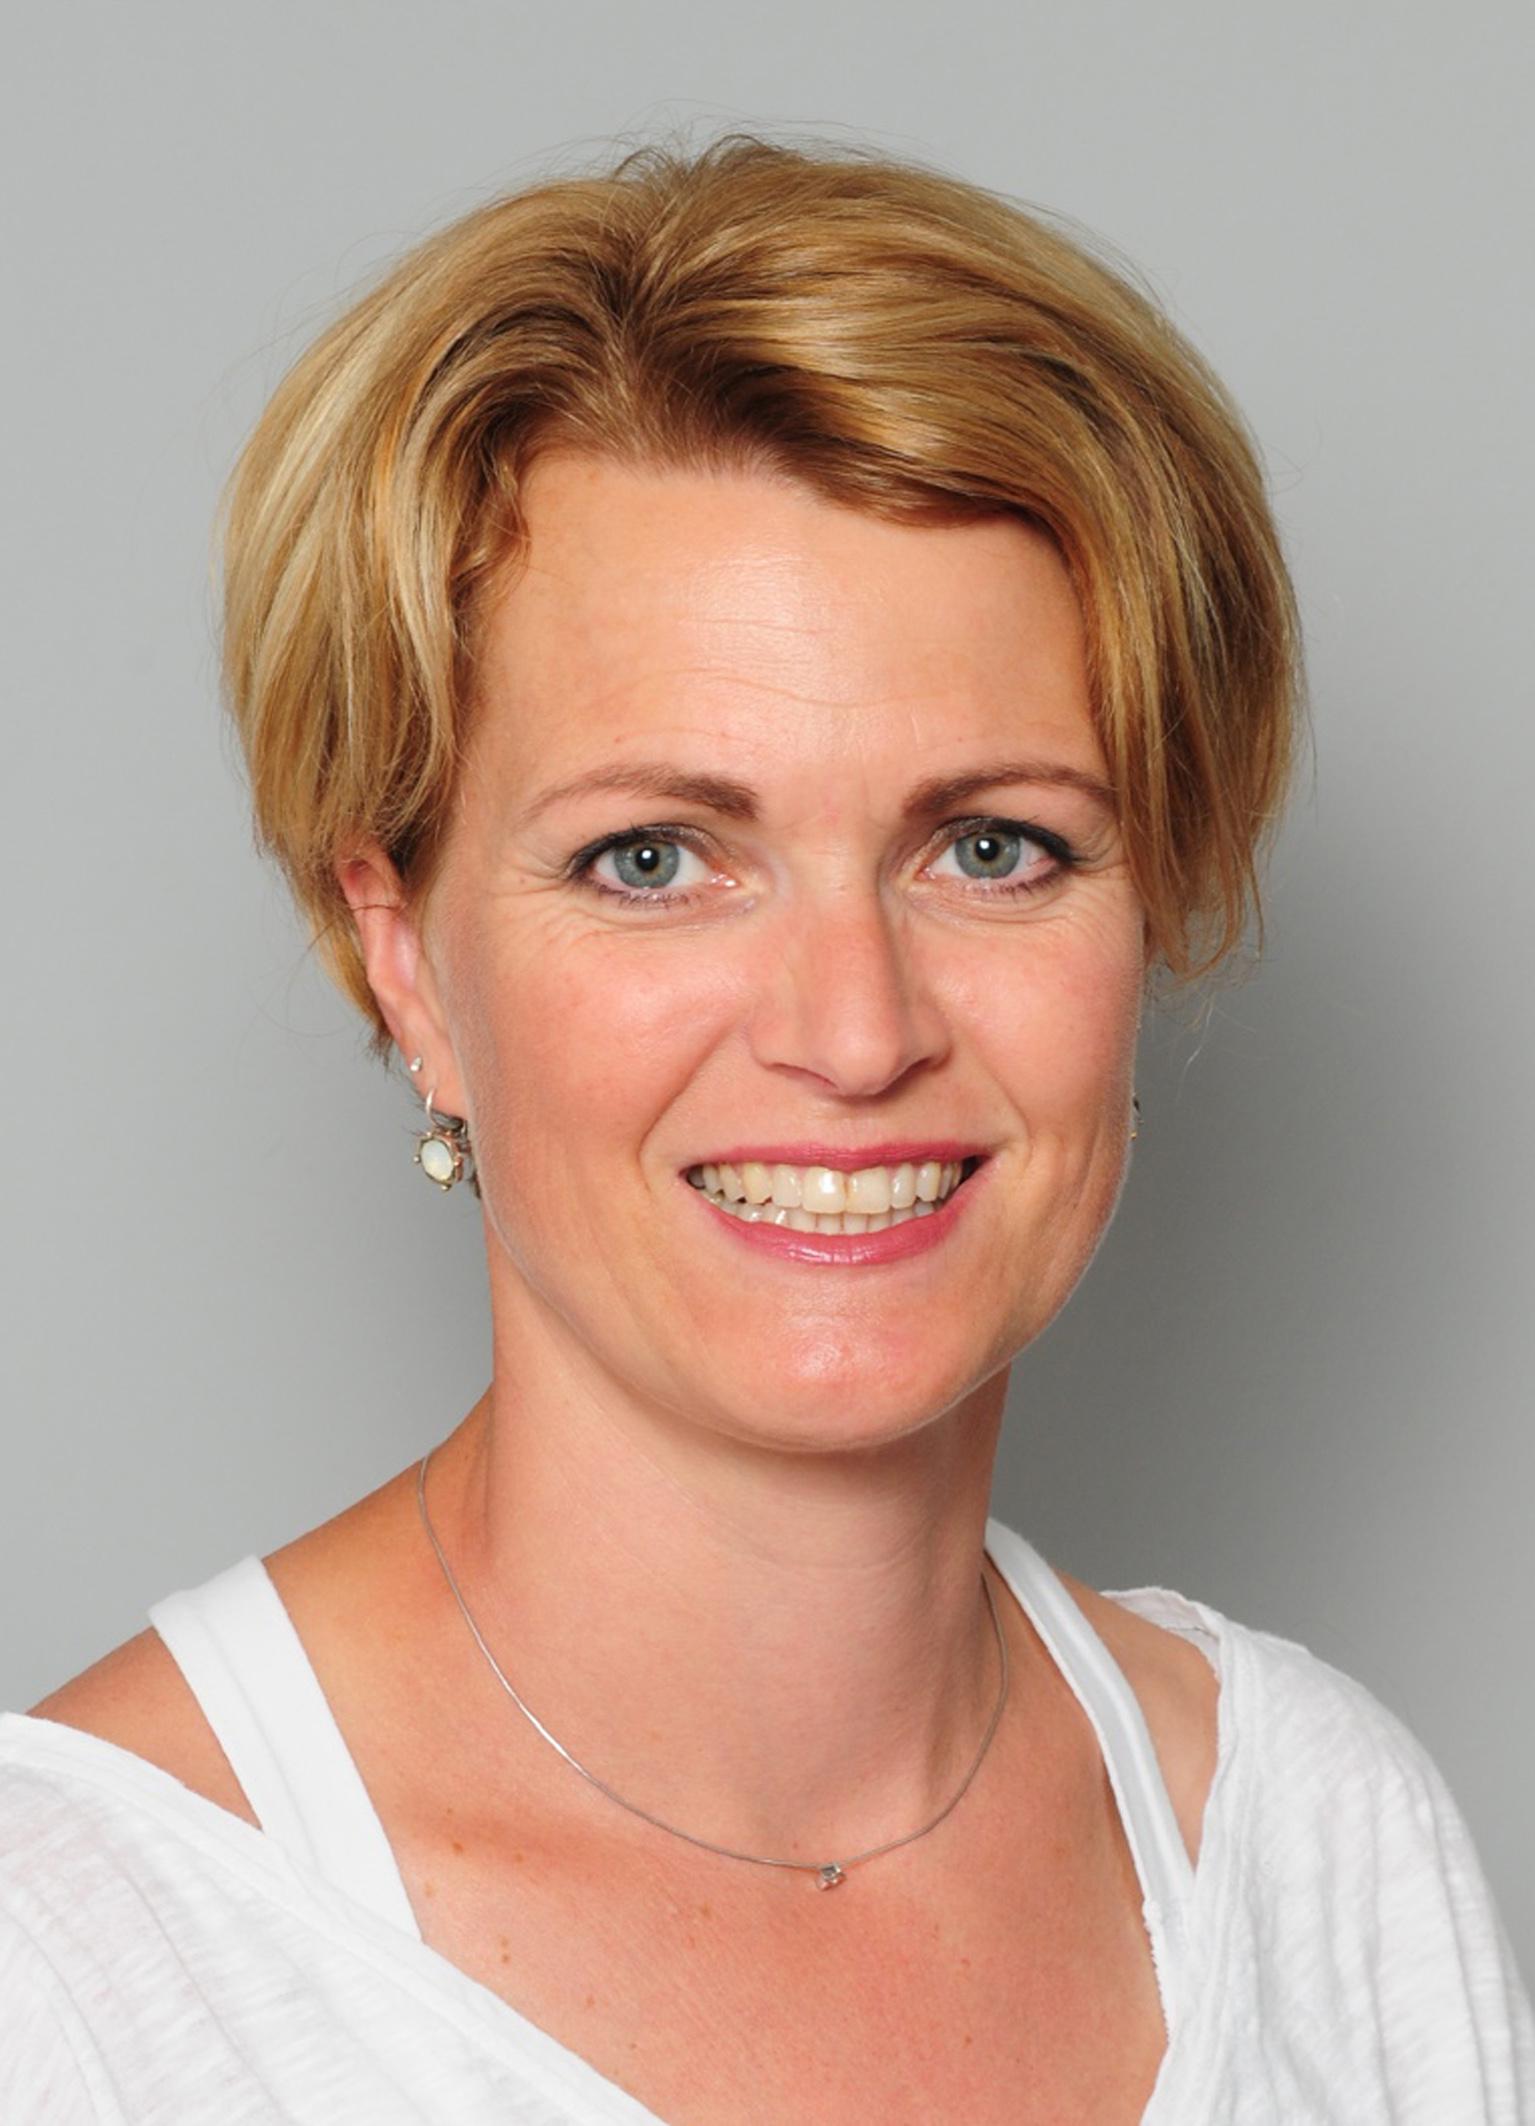 Simone Woudstra